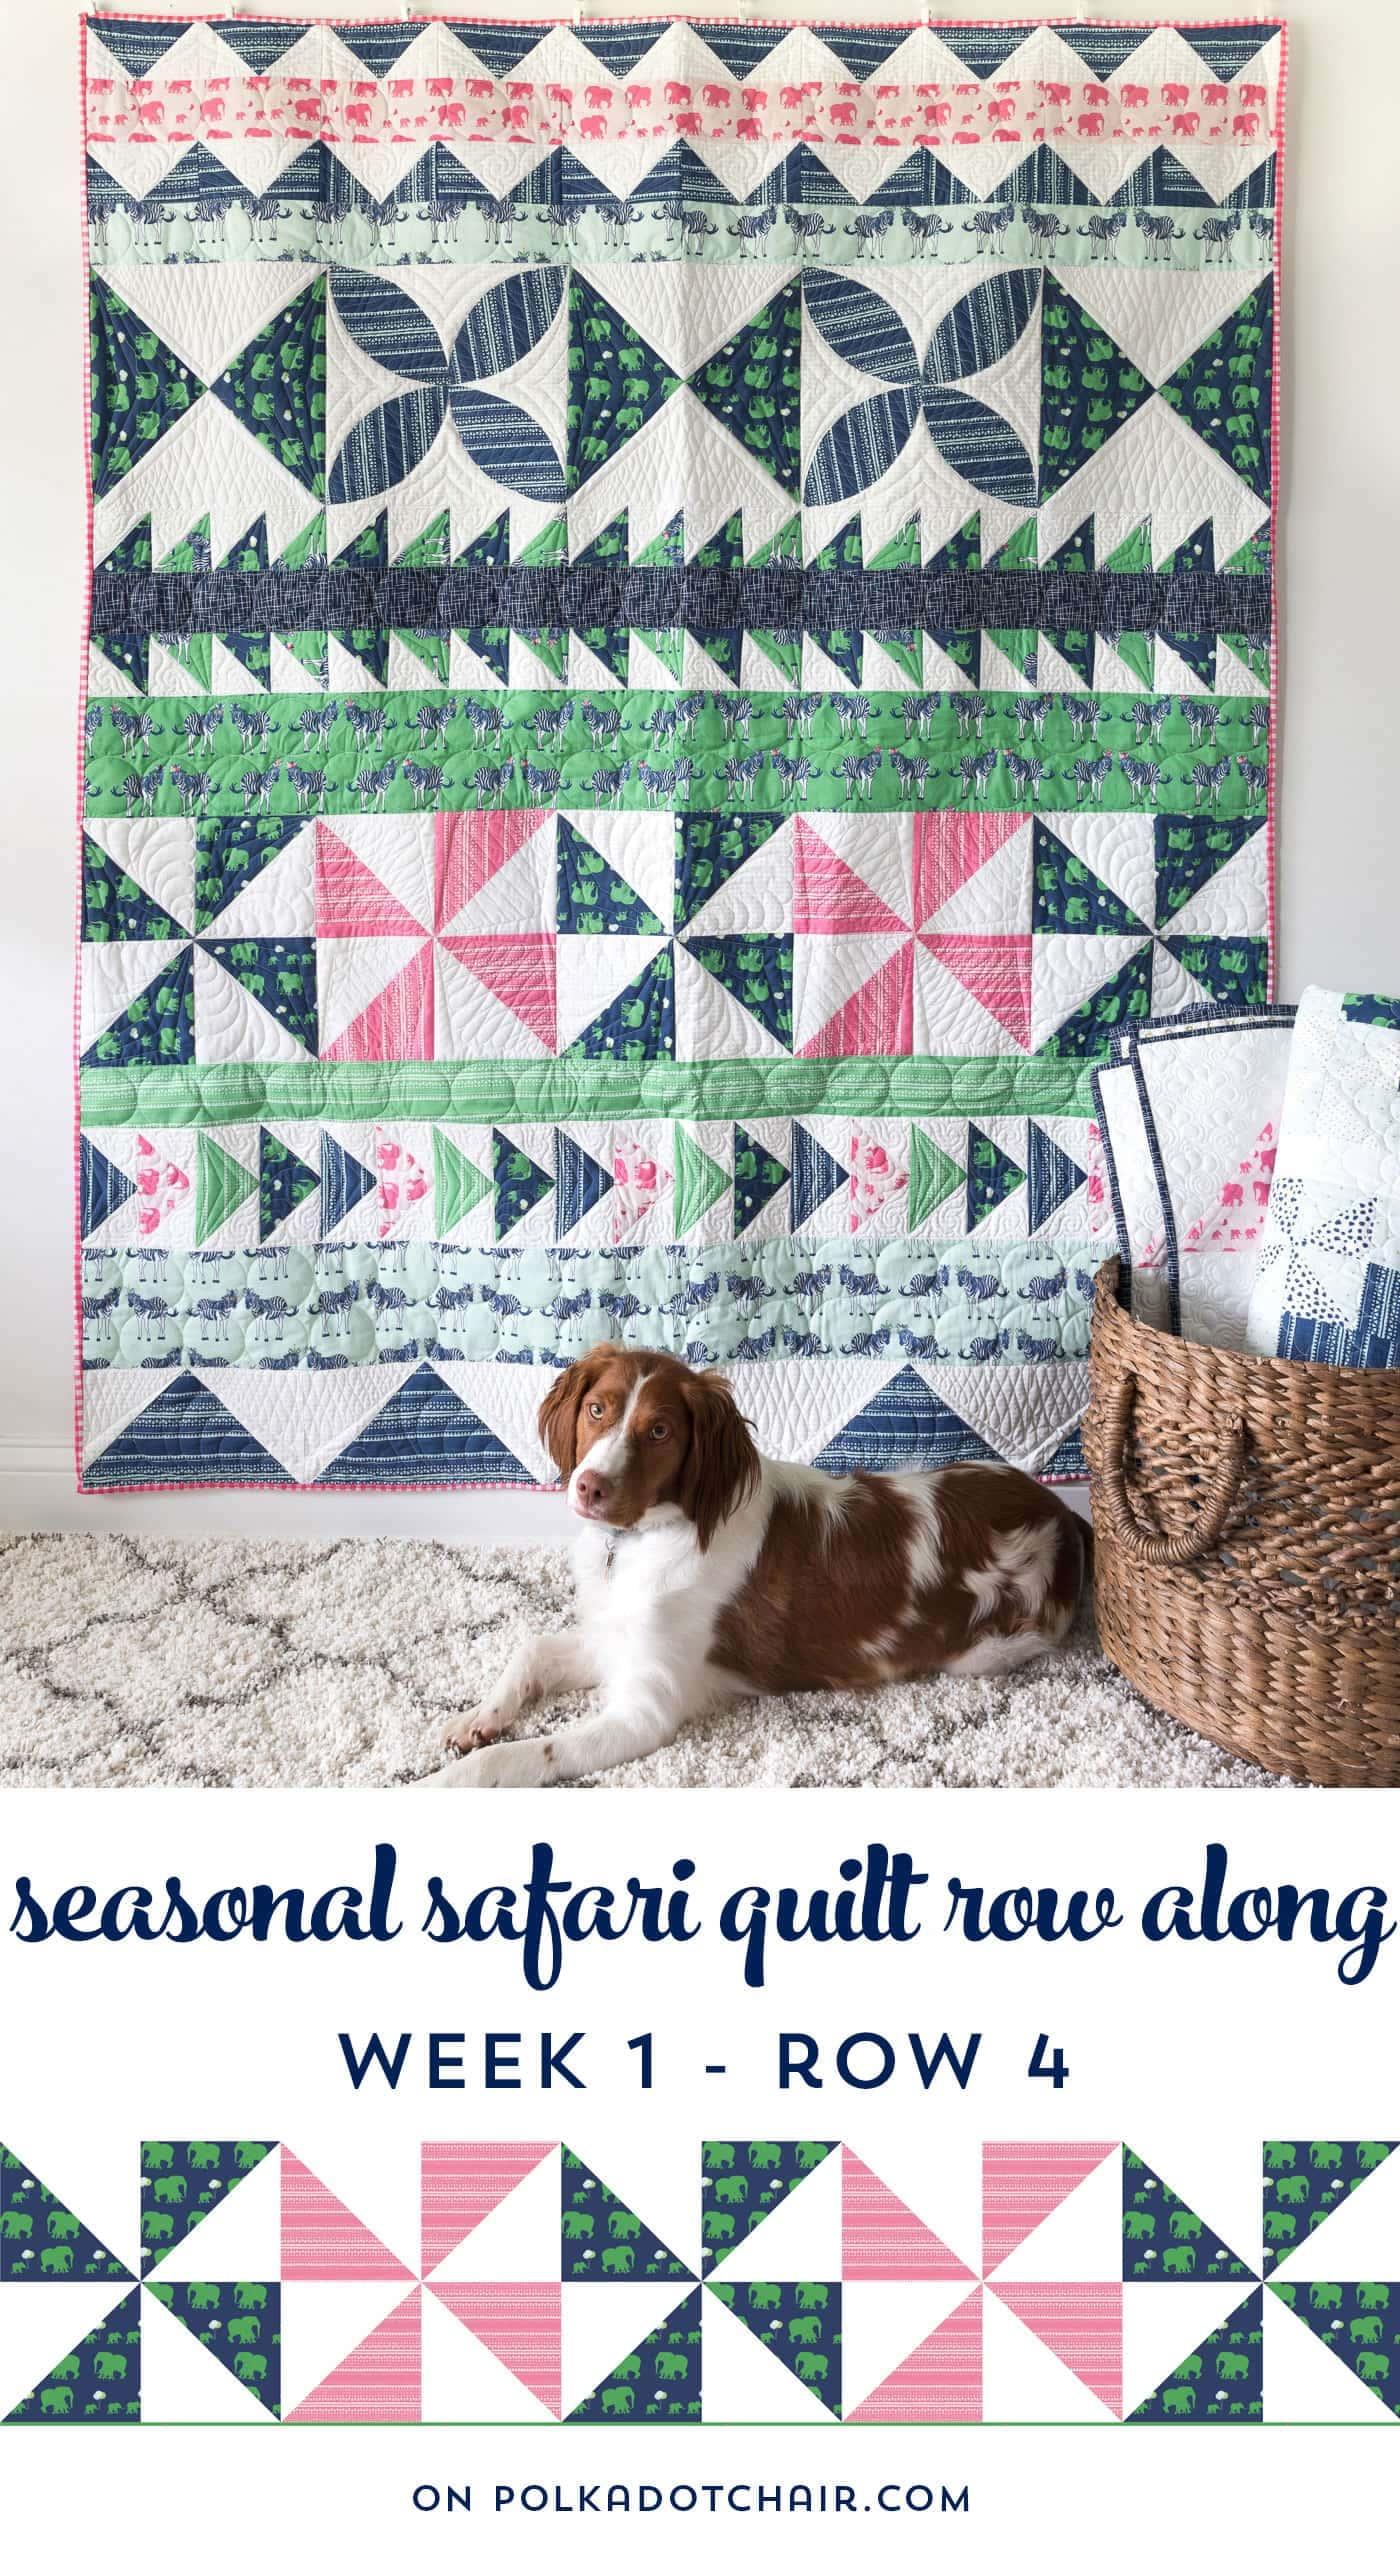 Seasonal Safari Quilt Row Along Row 4